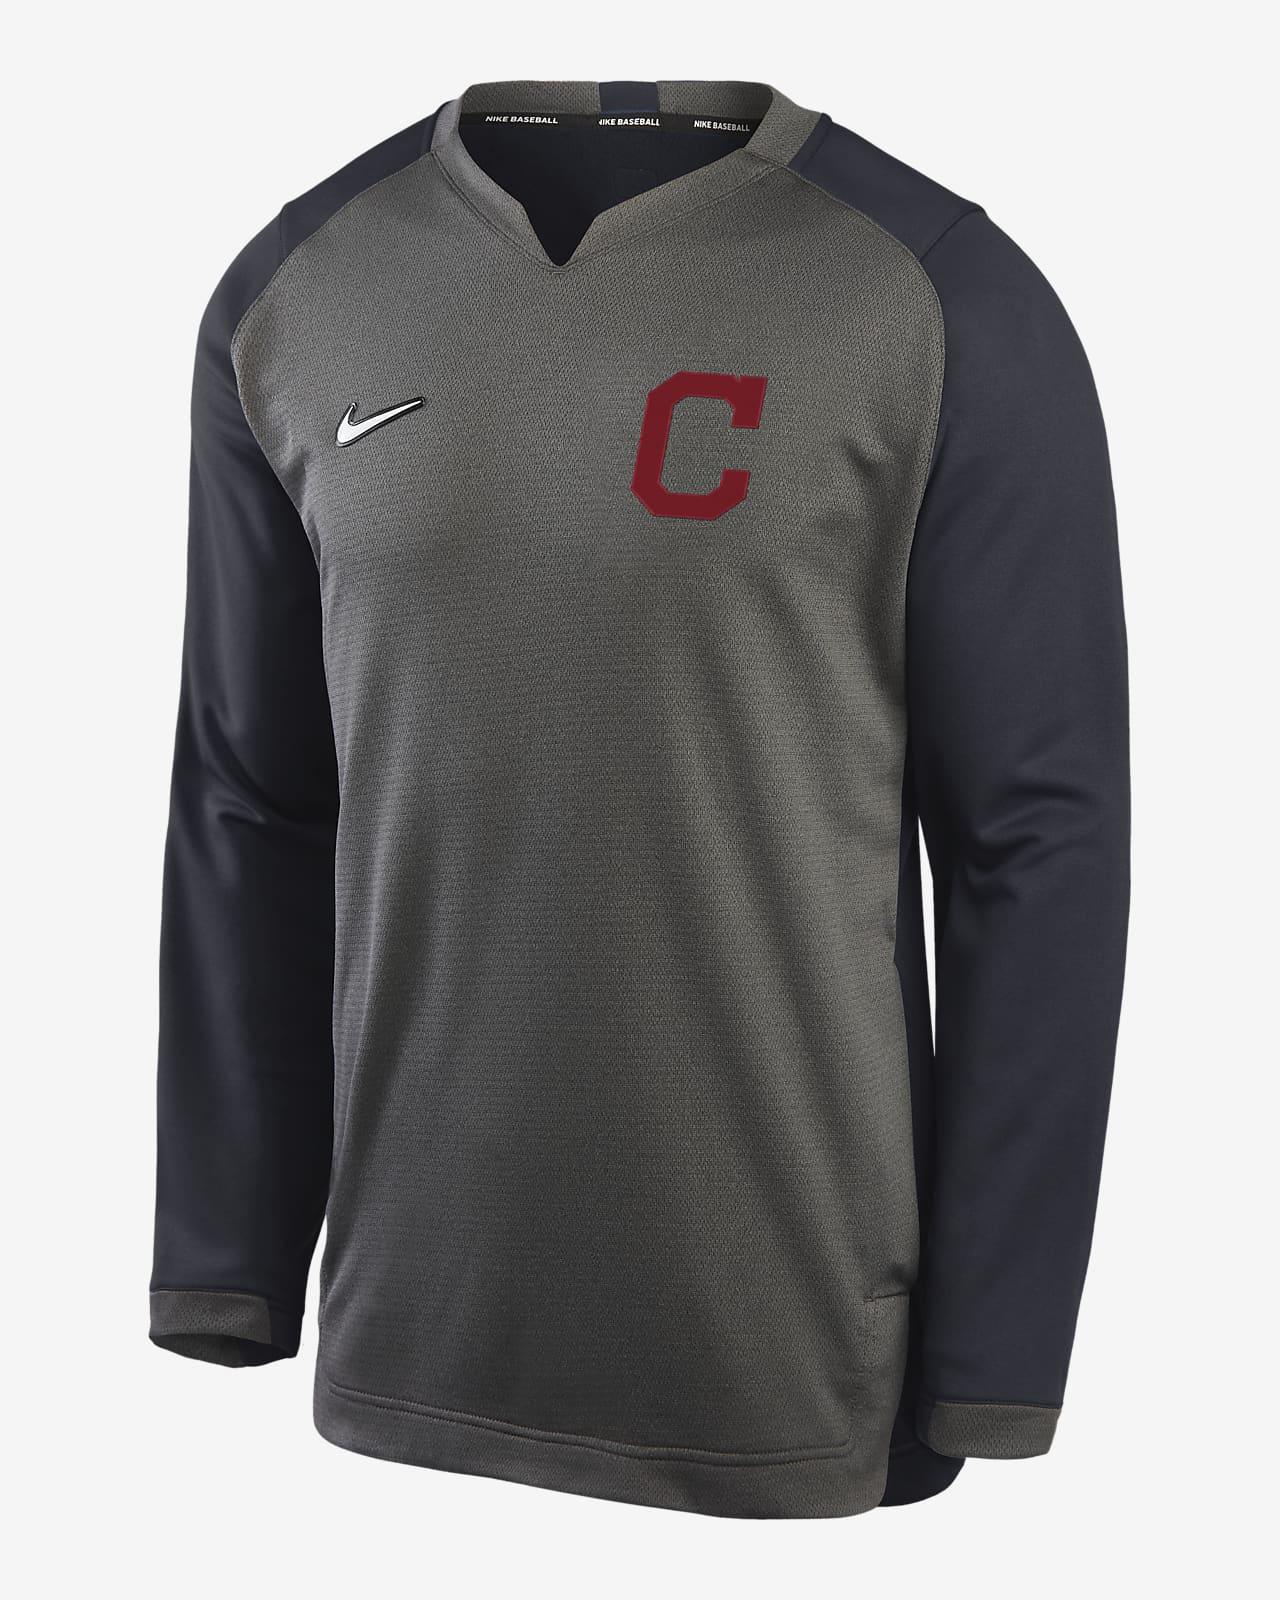 Nike Dri-FIT (MLB Cleveland) Men's Thermal Crew